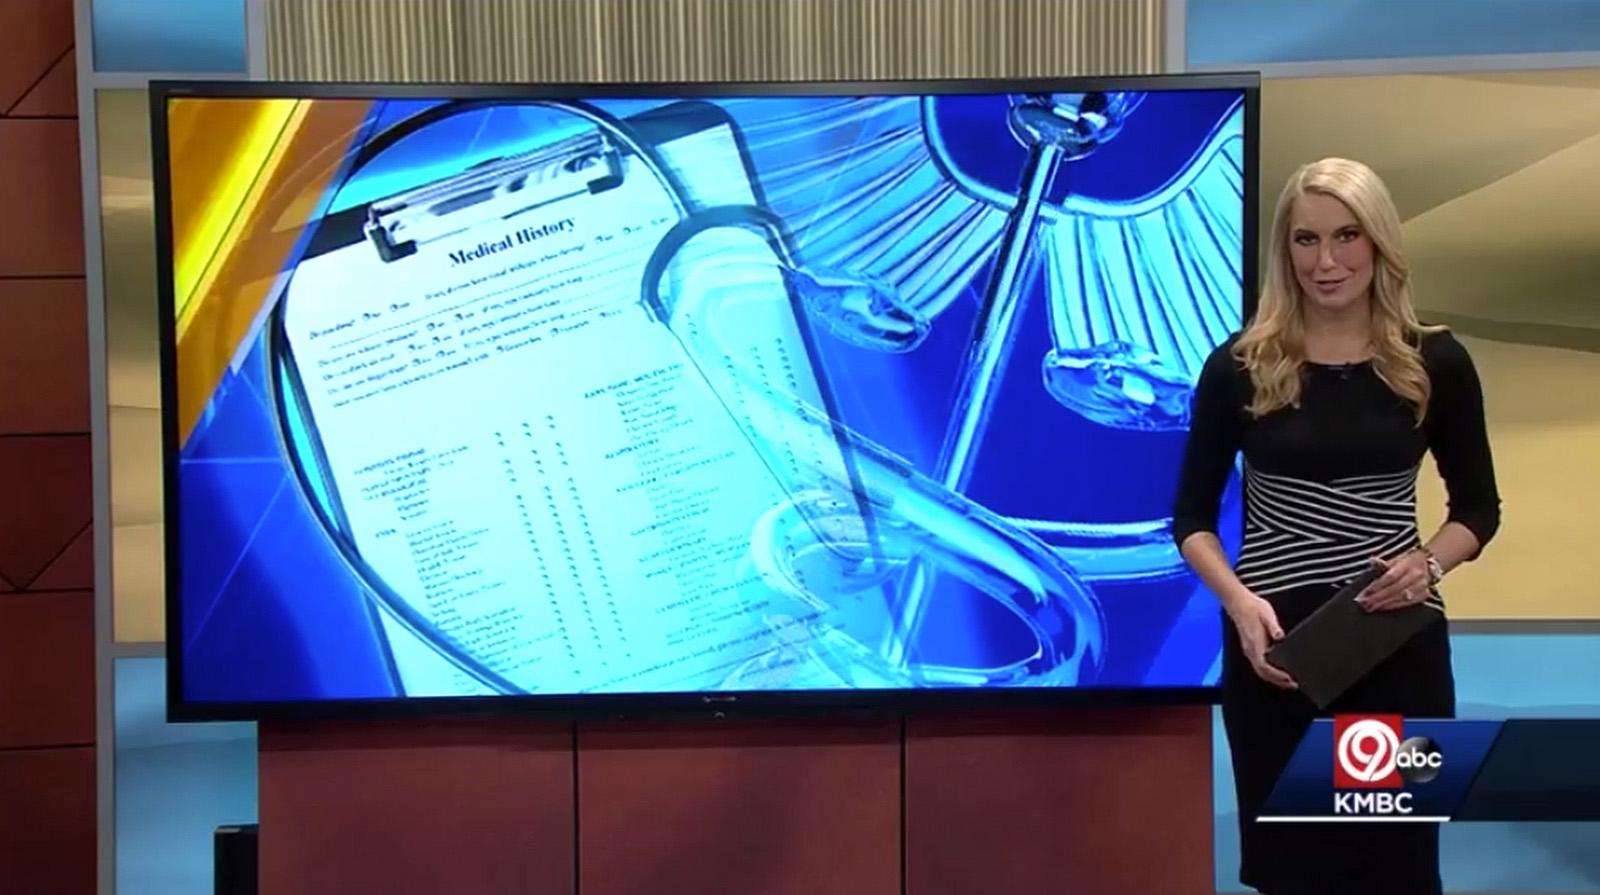 NCS_KMBC-9-News-TV-Studio_020